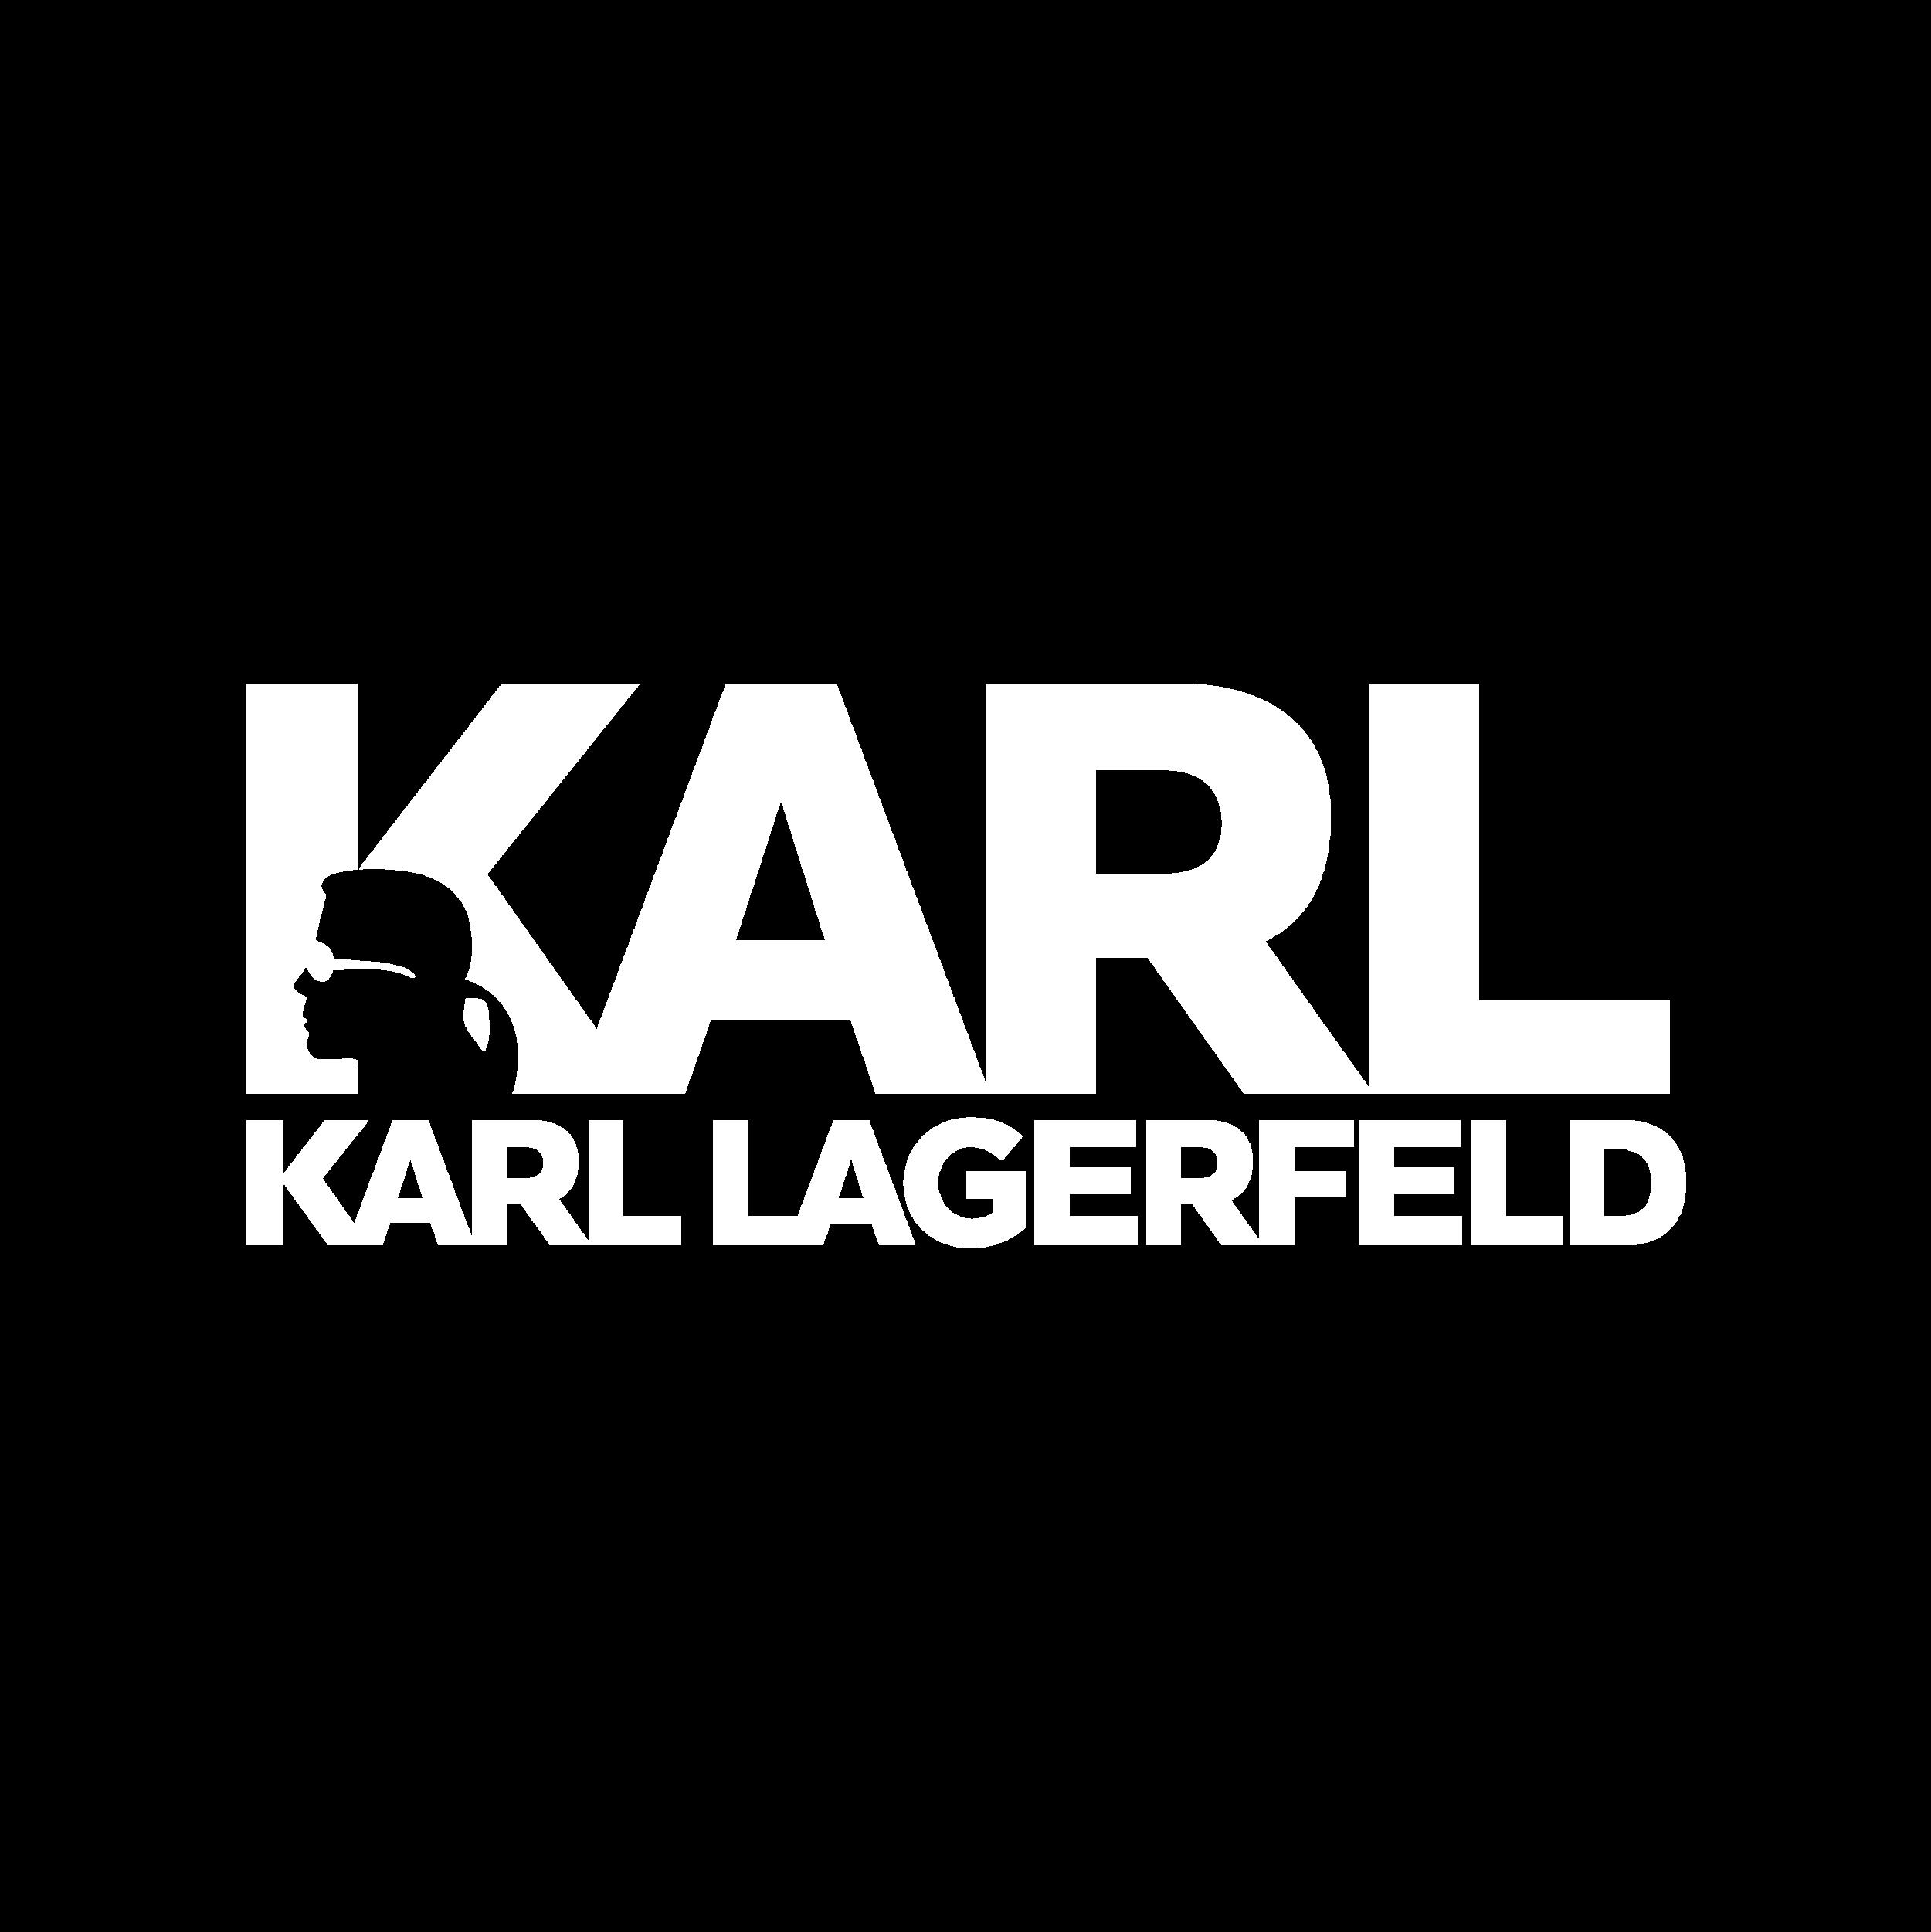 karl-lagerfeld-logo.png